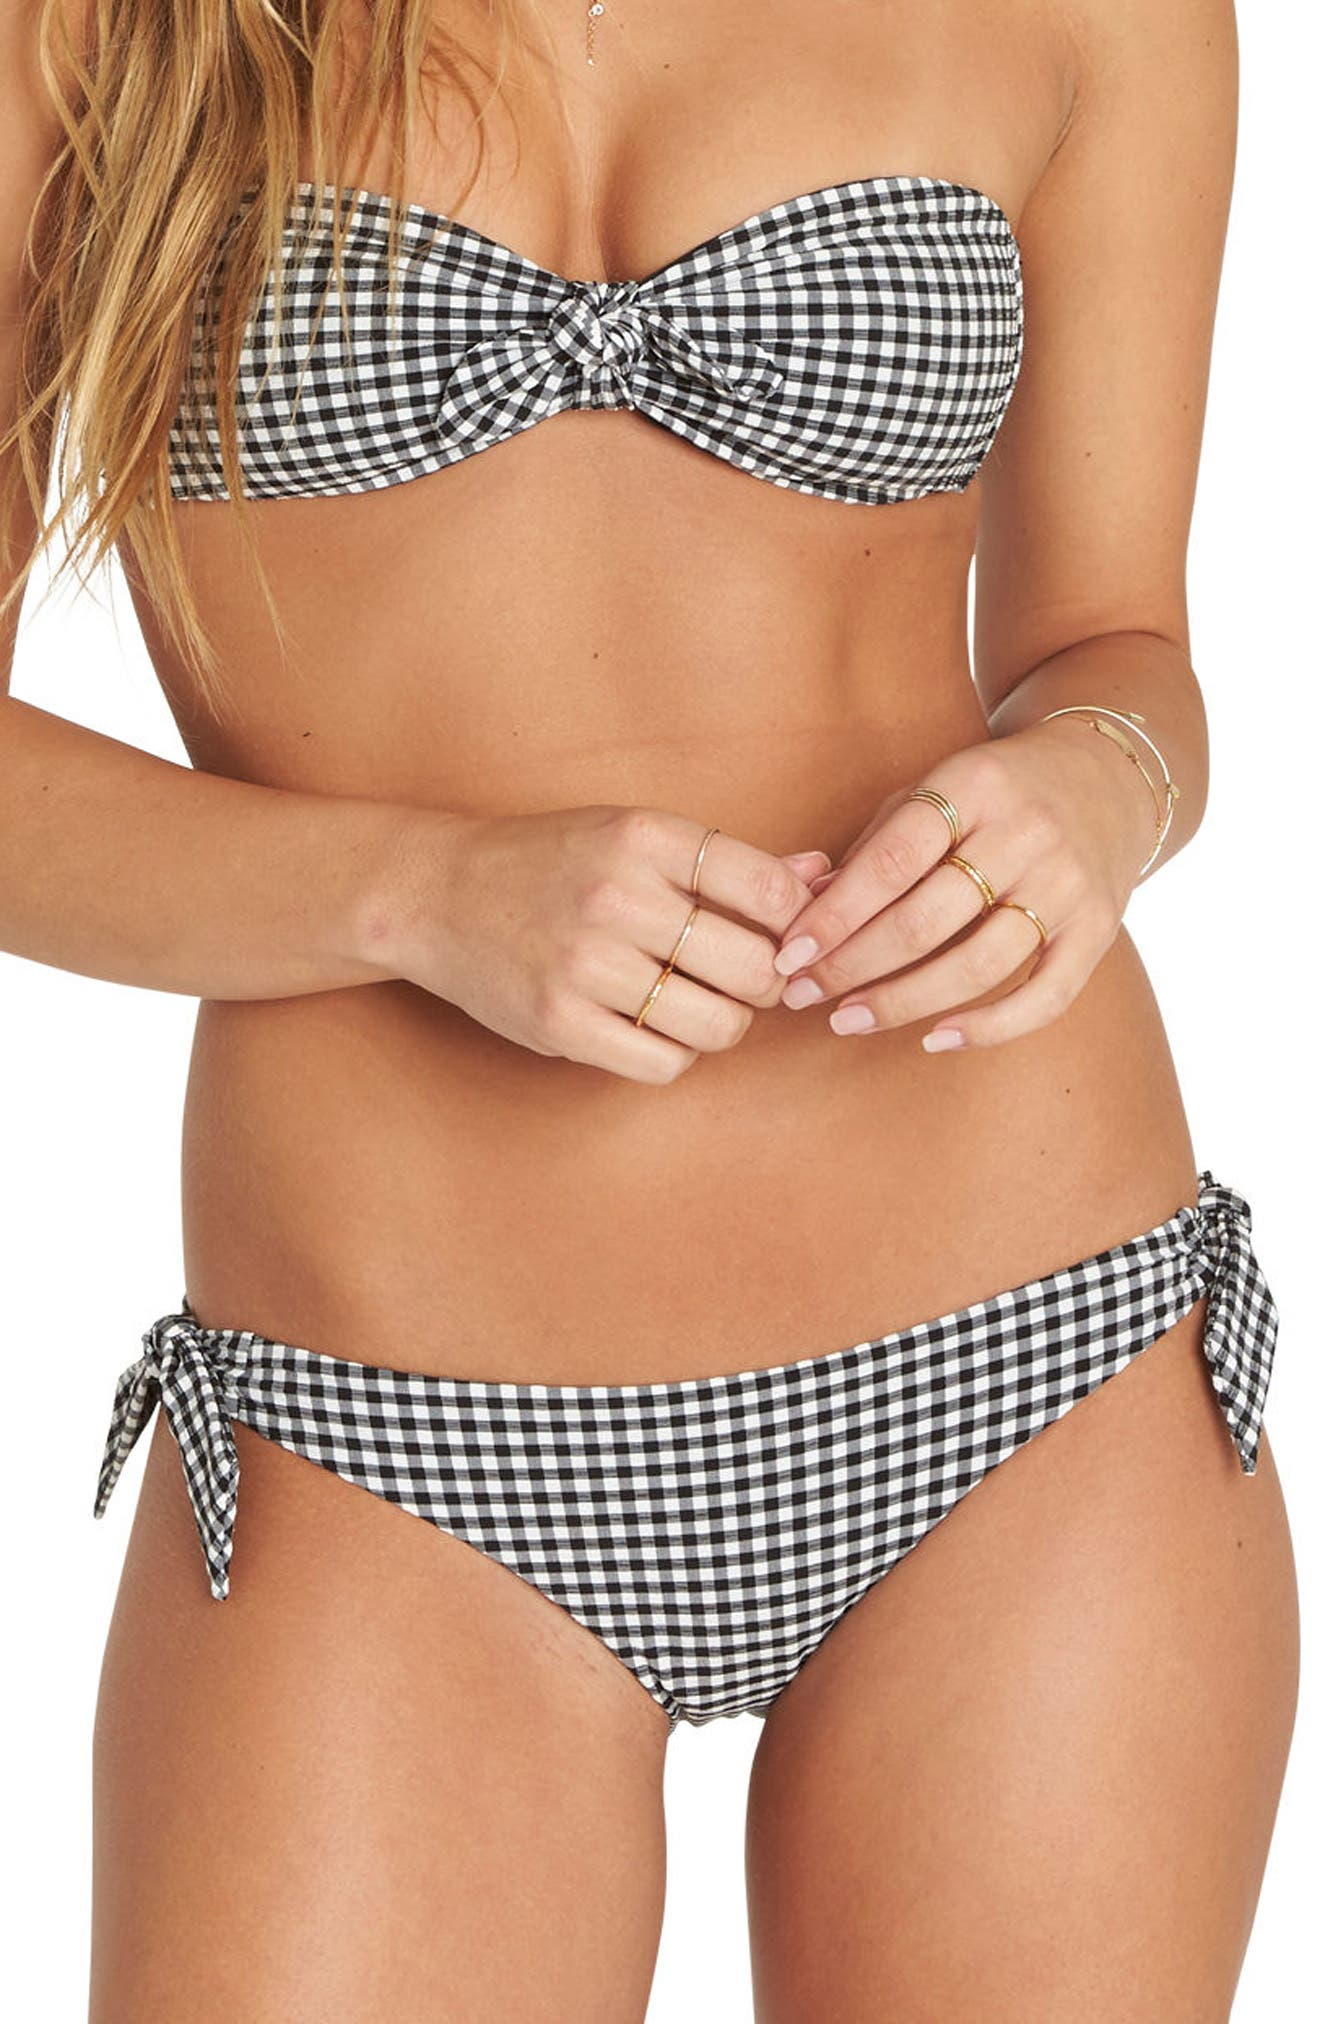 Surf Check Tropic Bikini Bottoms,                             Main thumbnail 1, color,                             Black Pebble